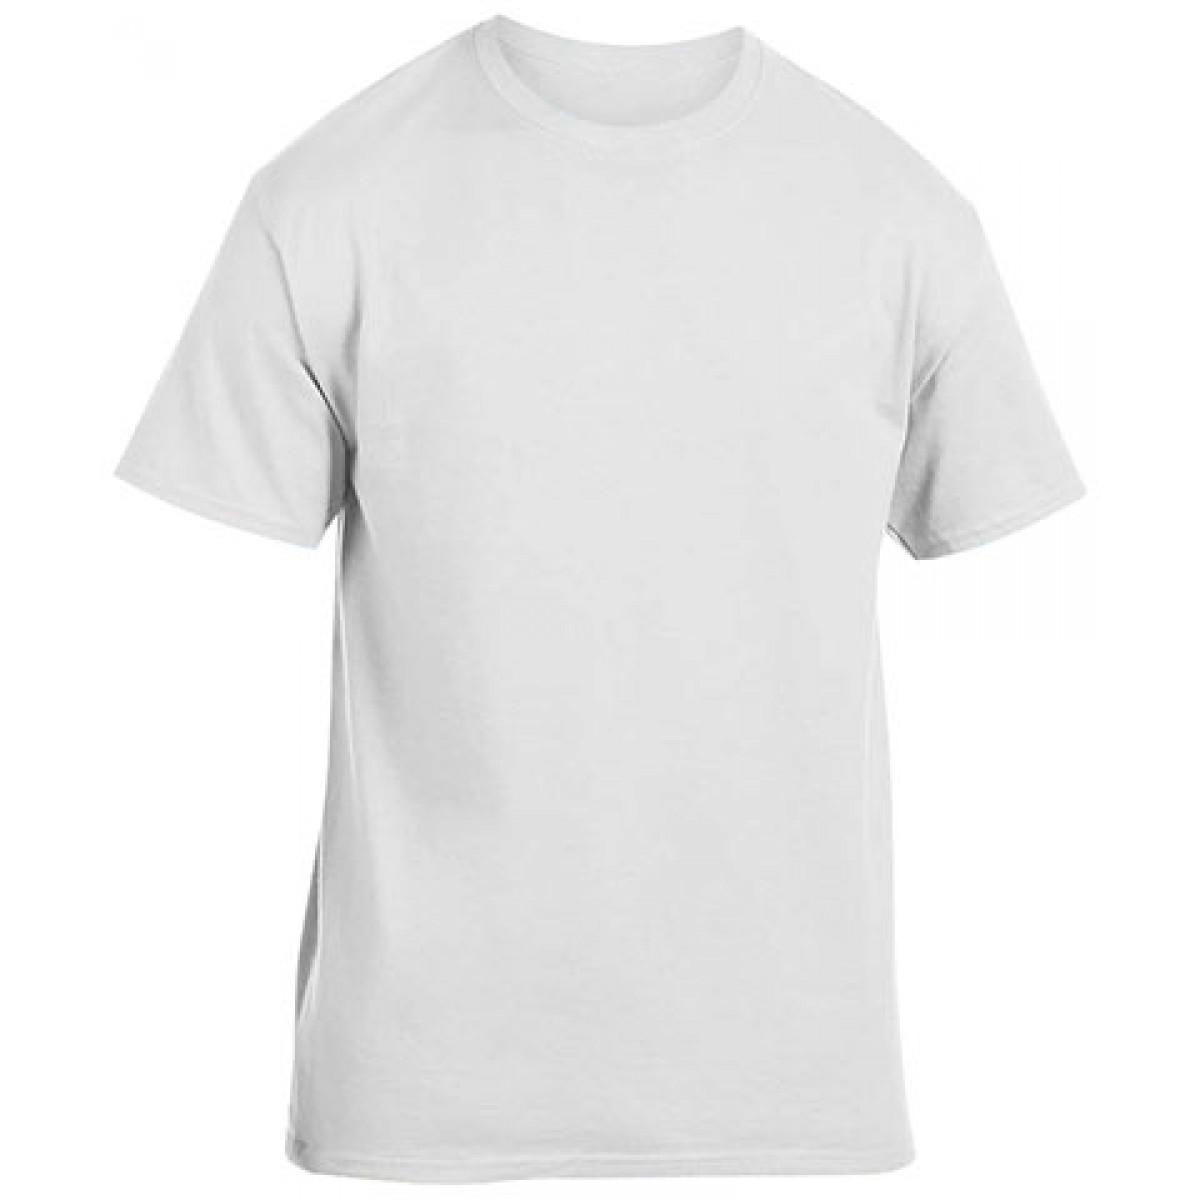 Heavy Cotton Activewear T-Shirt-White-2XL